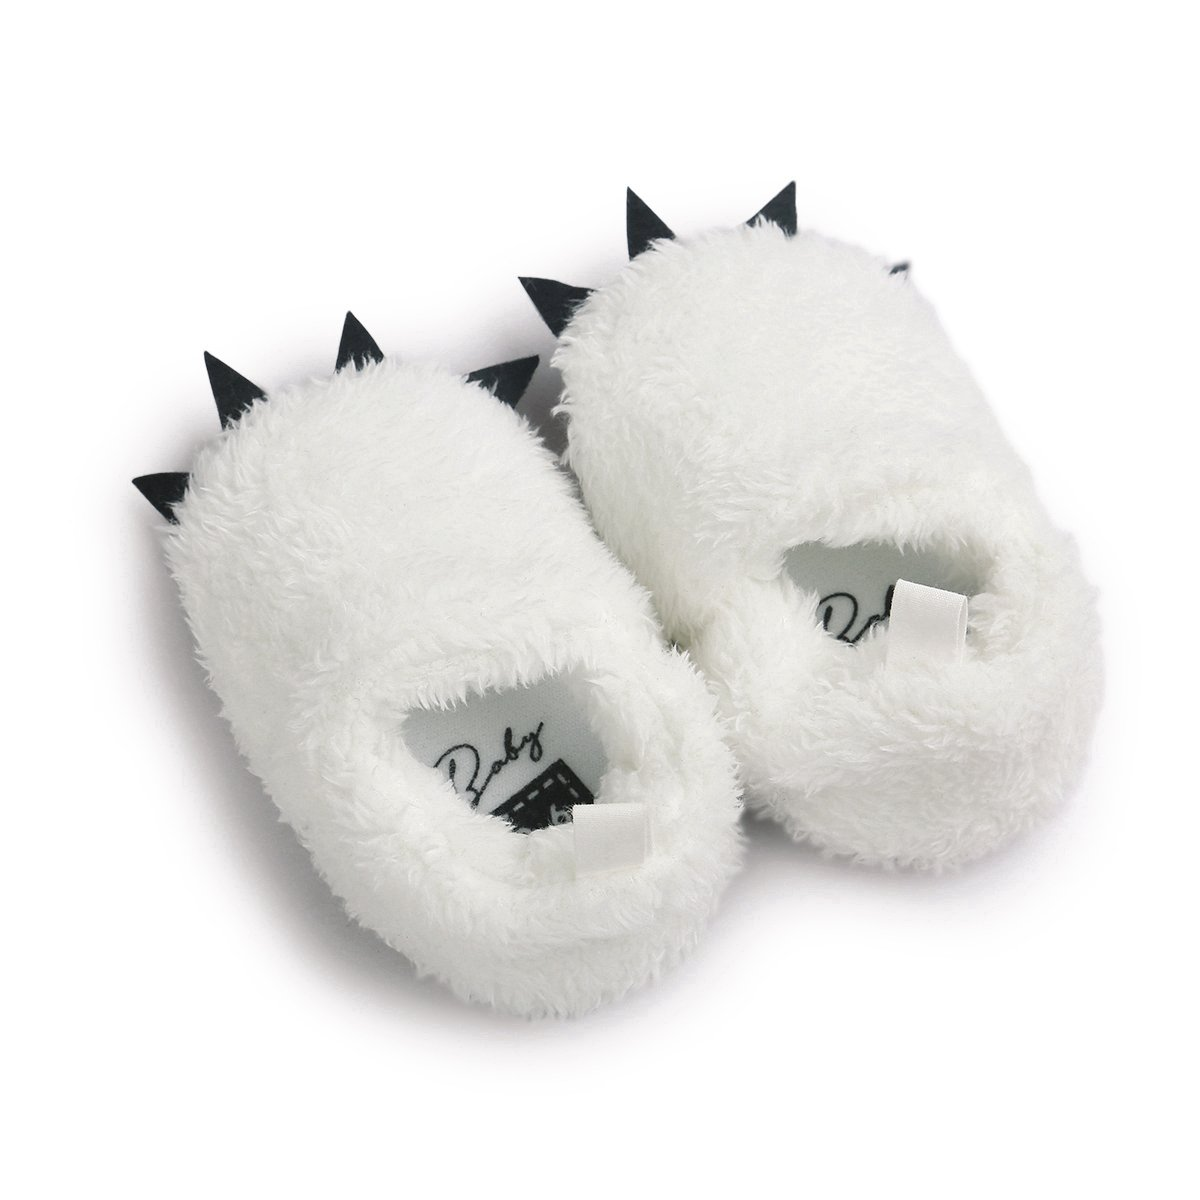 Vanbuy Baby Boys Girls Shoes Bear Paw Animal Slippers Boots Newborn Infant Crib Shoes WB28-White-L by Vanbuy (Image #3)